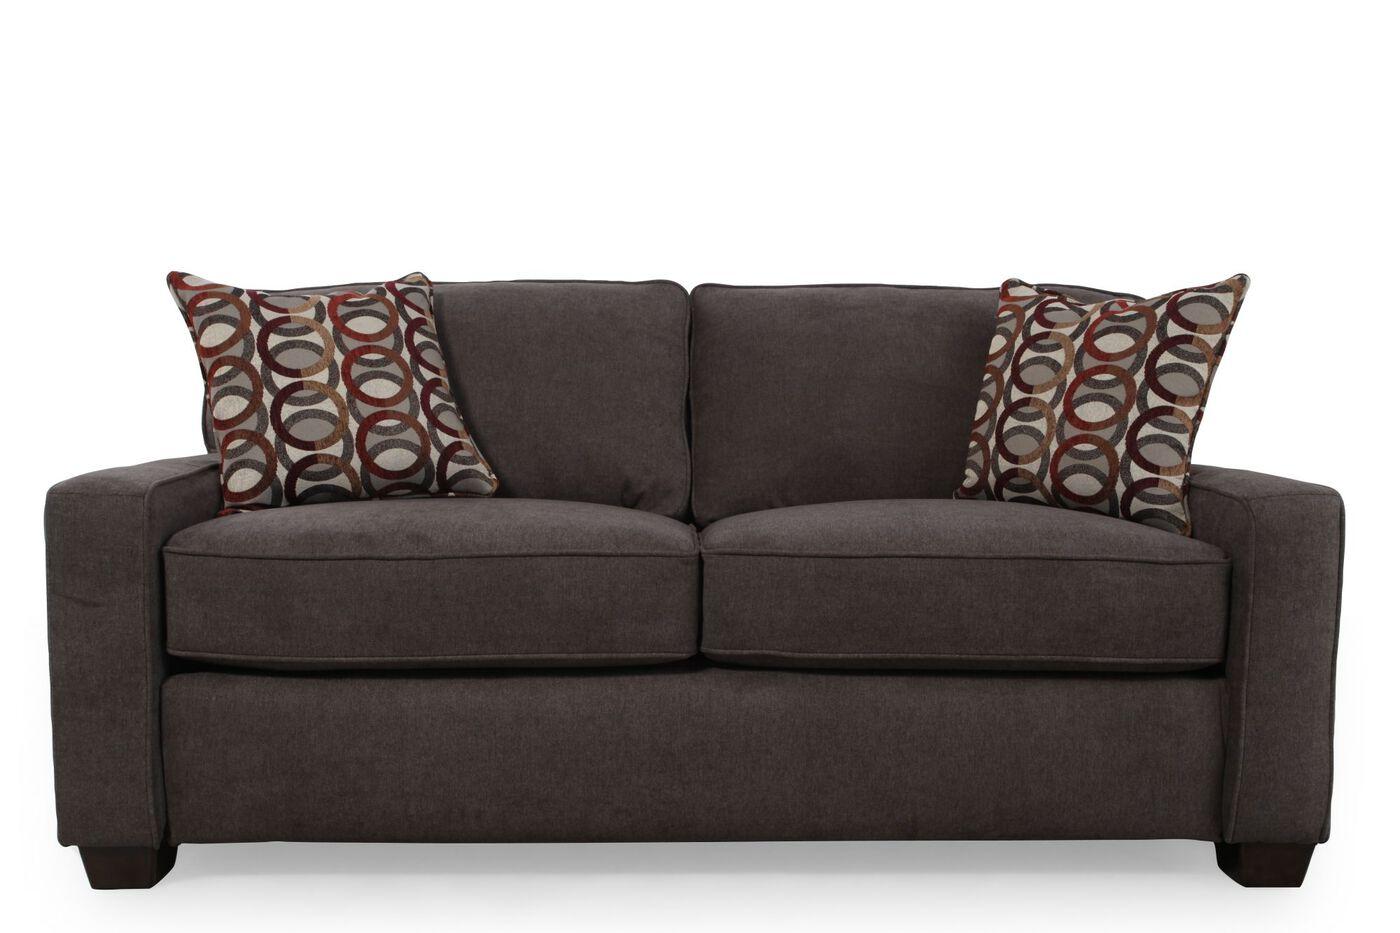 Lane Sofa Bed Megan Double Reclining Sofa Lane Furniture  : LANE 677250474181 14 from thesofa.droogkast.com size 1400 x 933 jpeg 103kB